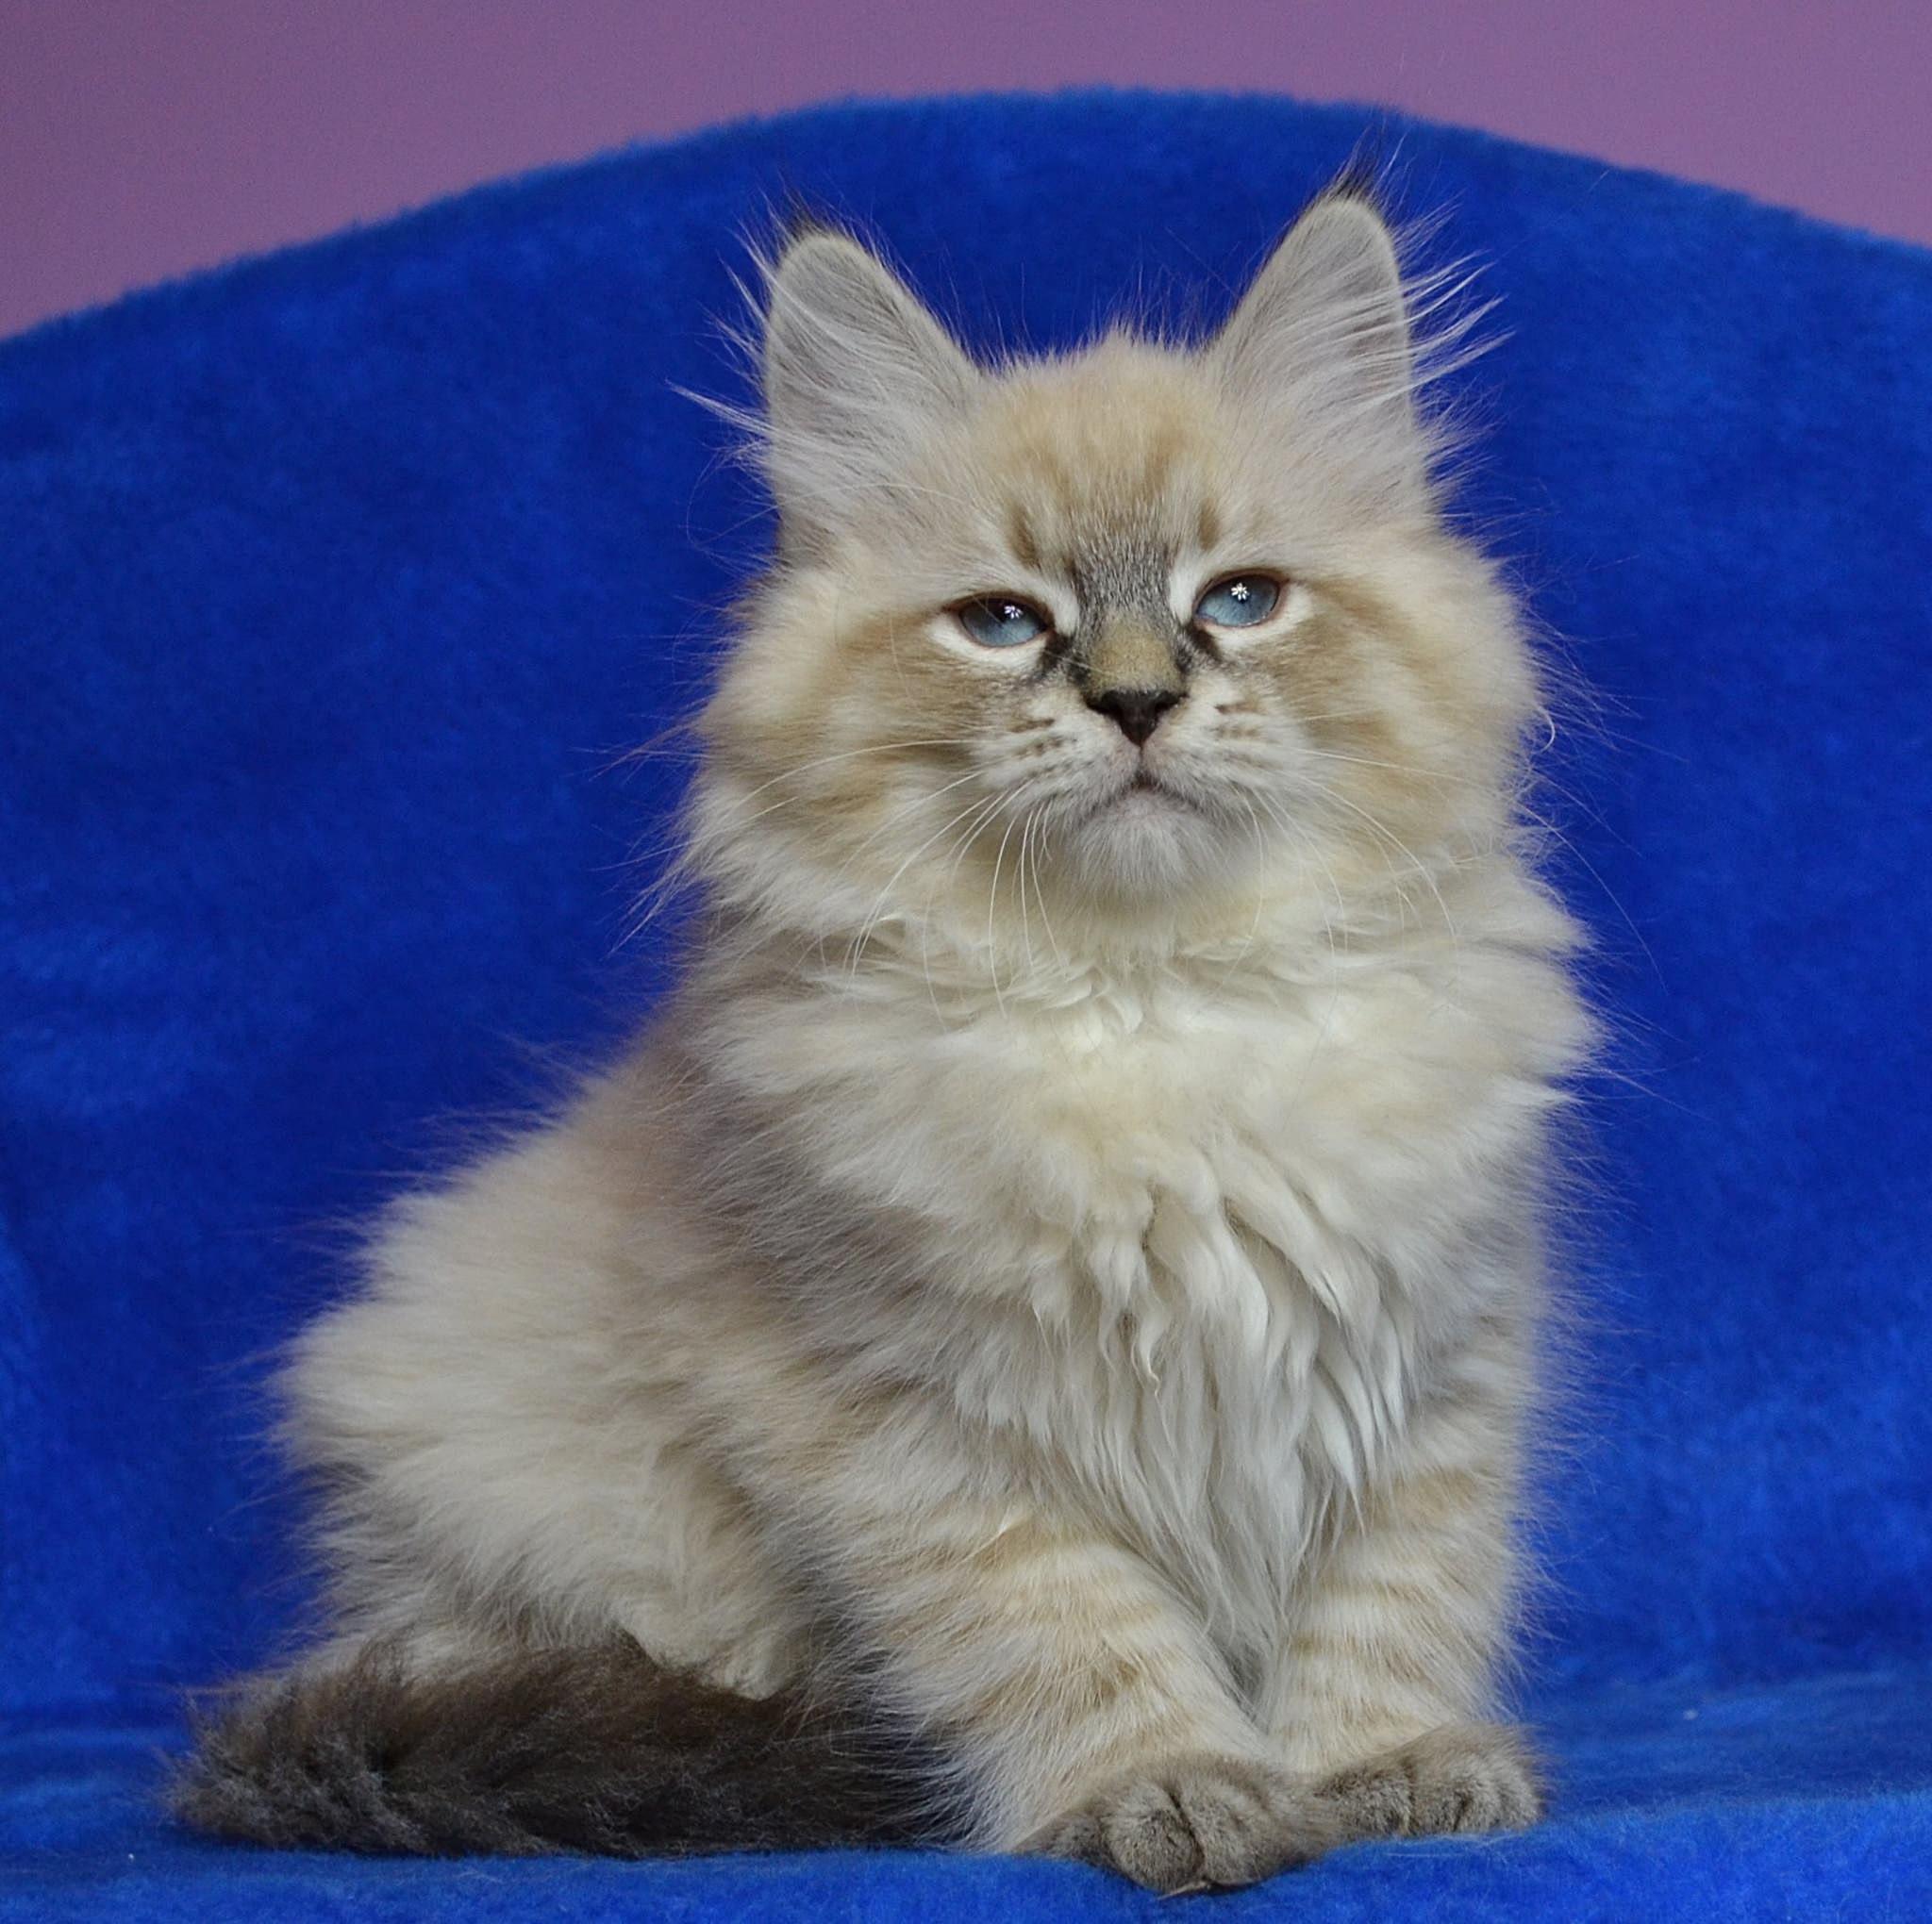 neva-nasquerade-warszawa-koty-syberyjskie